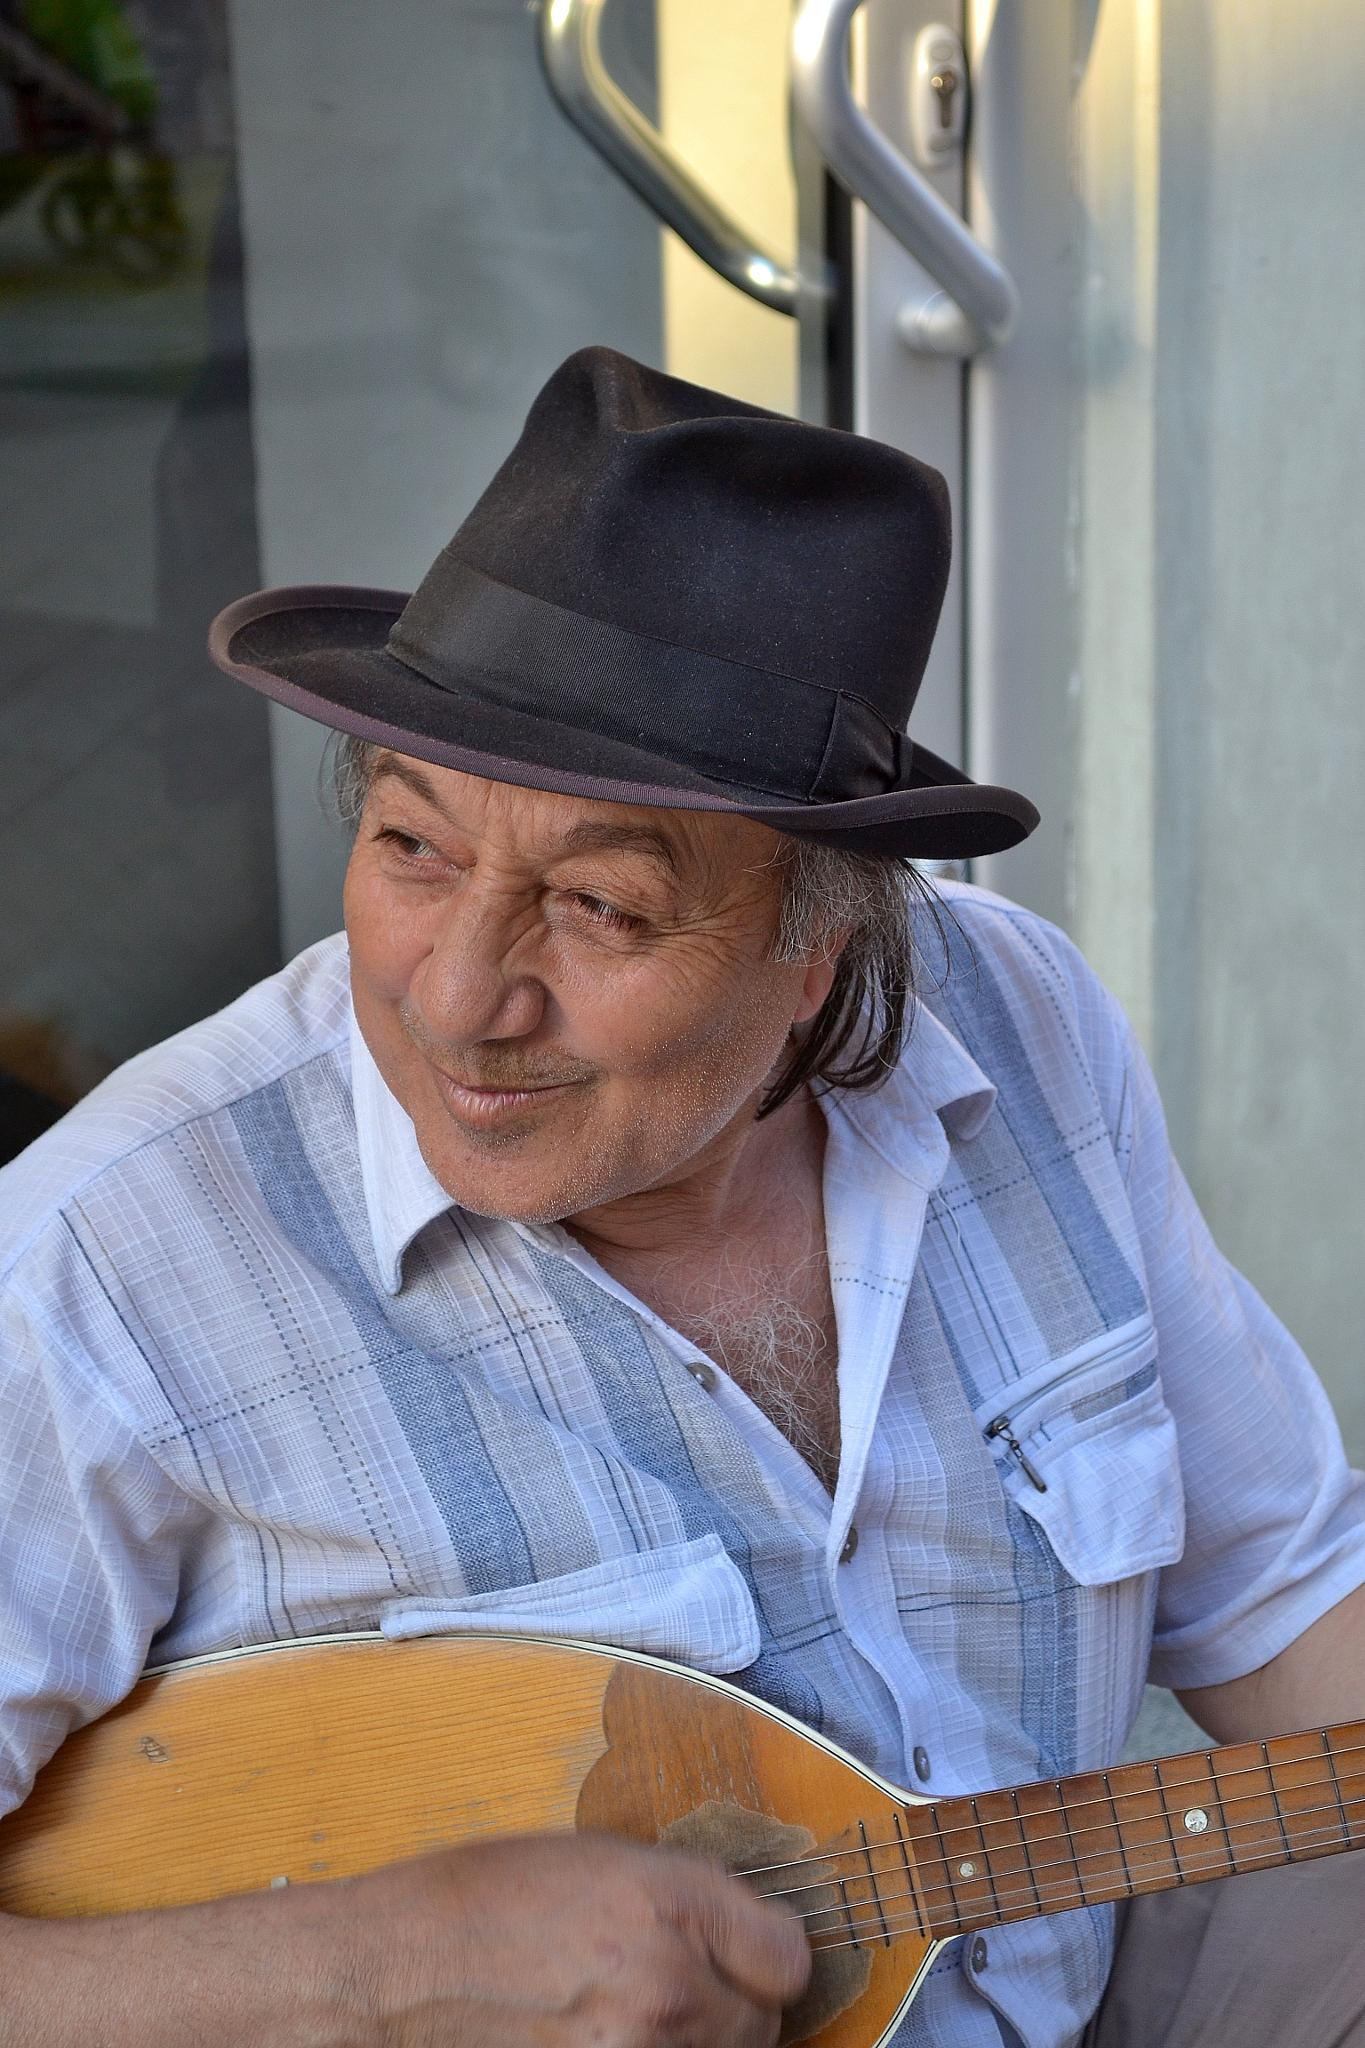 STREET MUSICIAN by tatjanasudicki